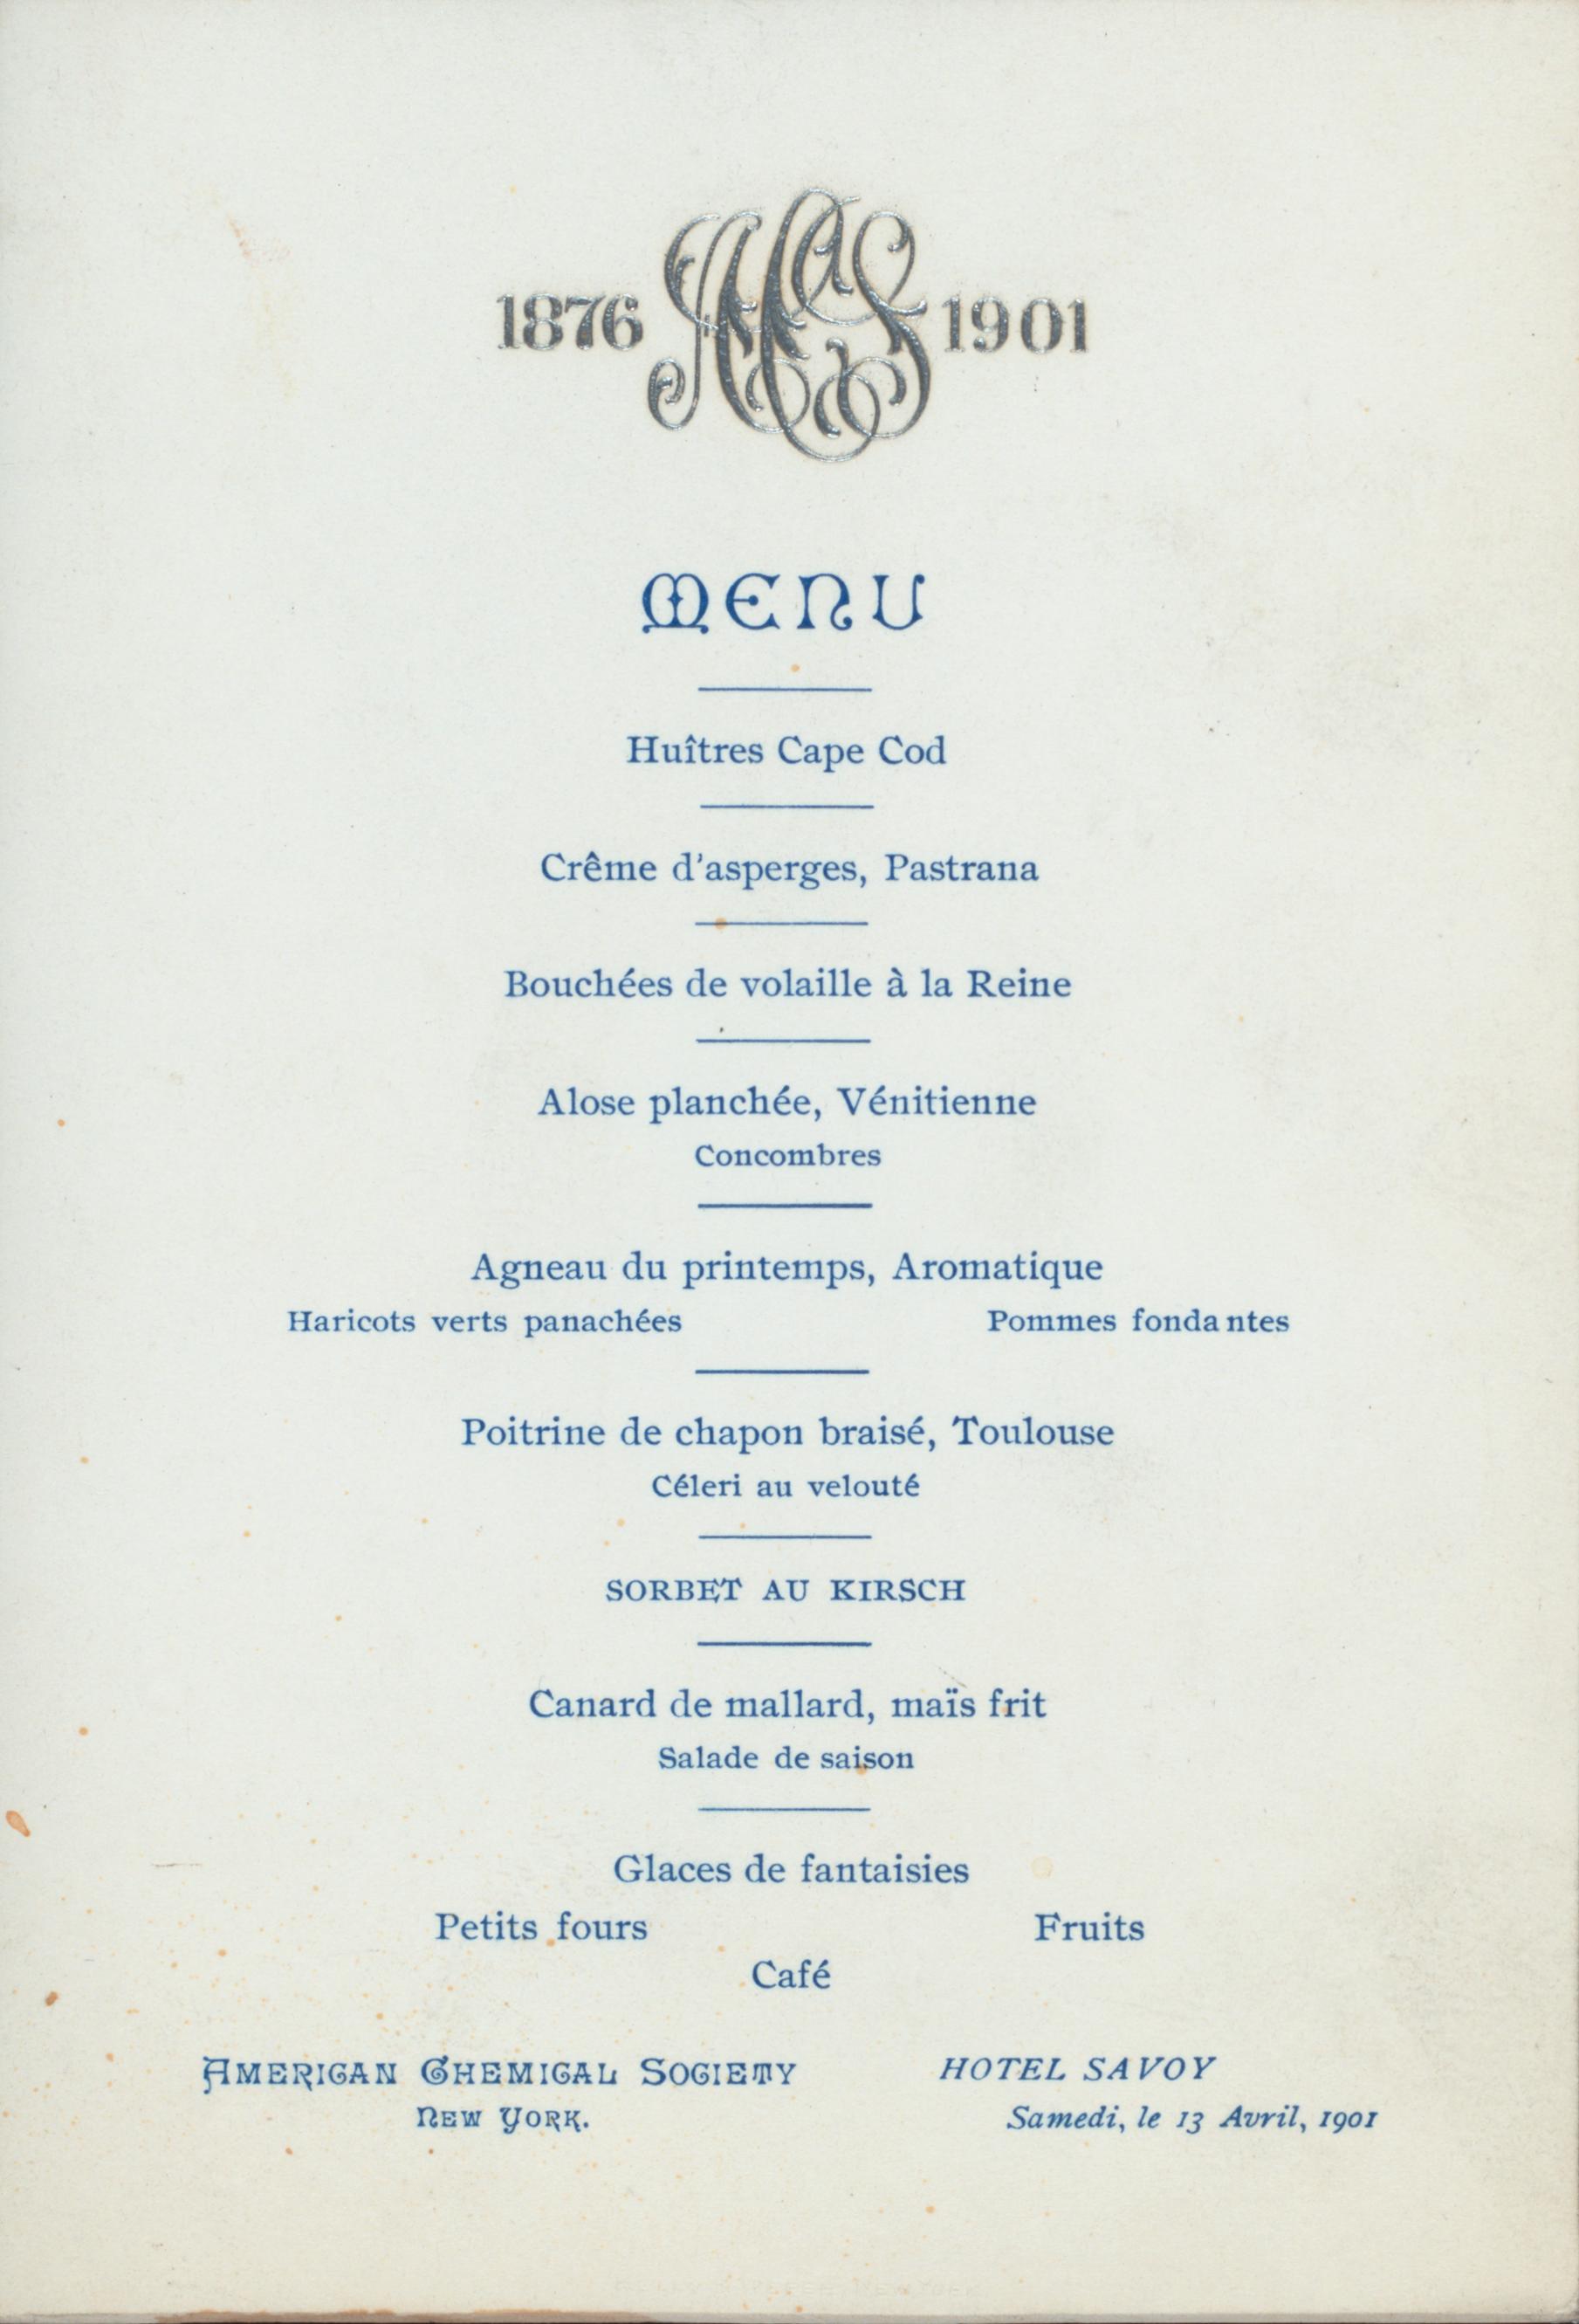 1809 Menu file:menu card - wikimedia commons